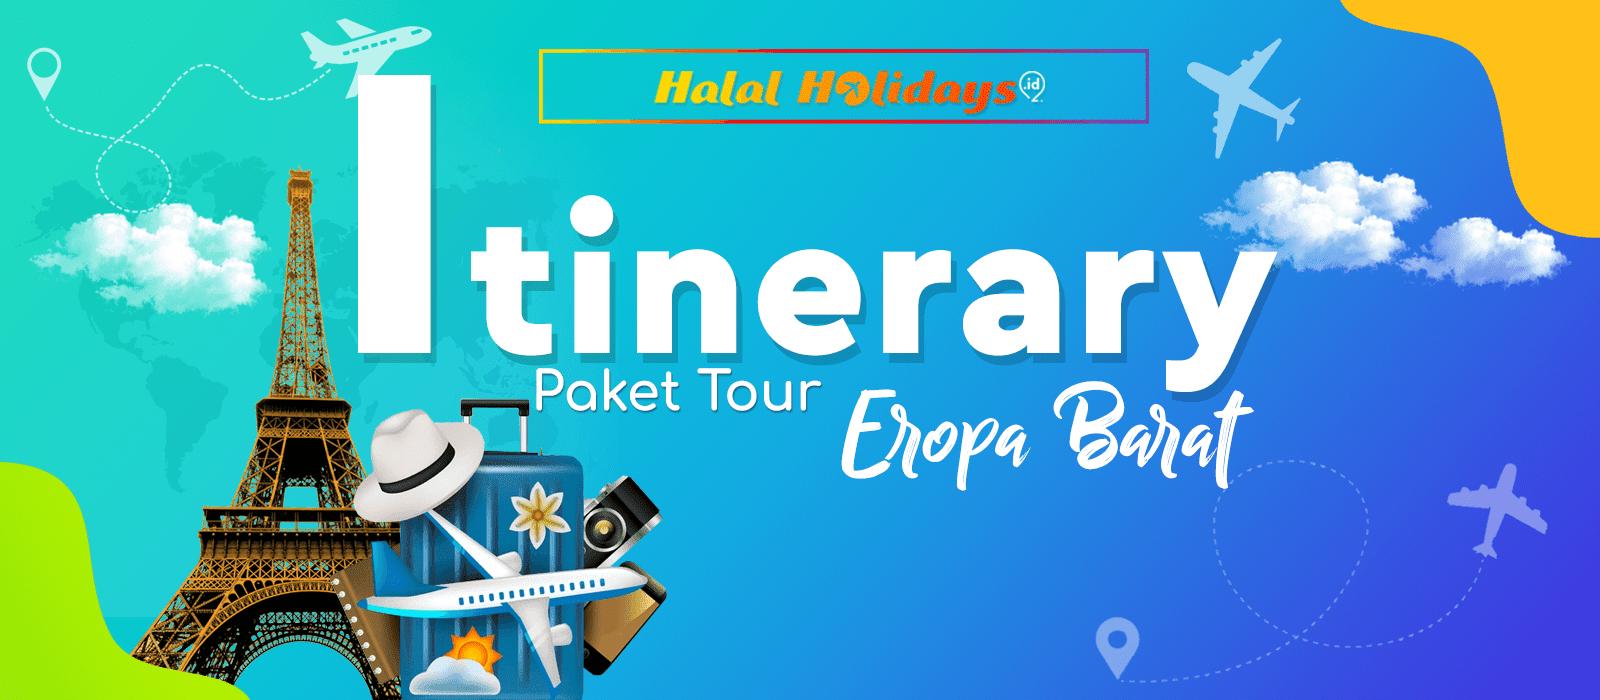 Itinerary Paket Tour Eropa Barat 10 Hari